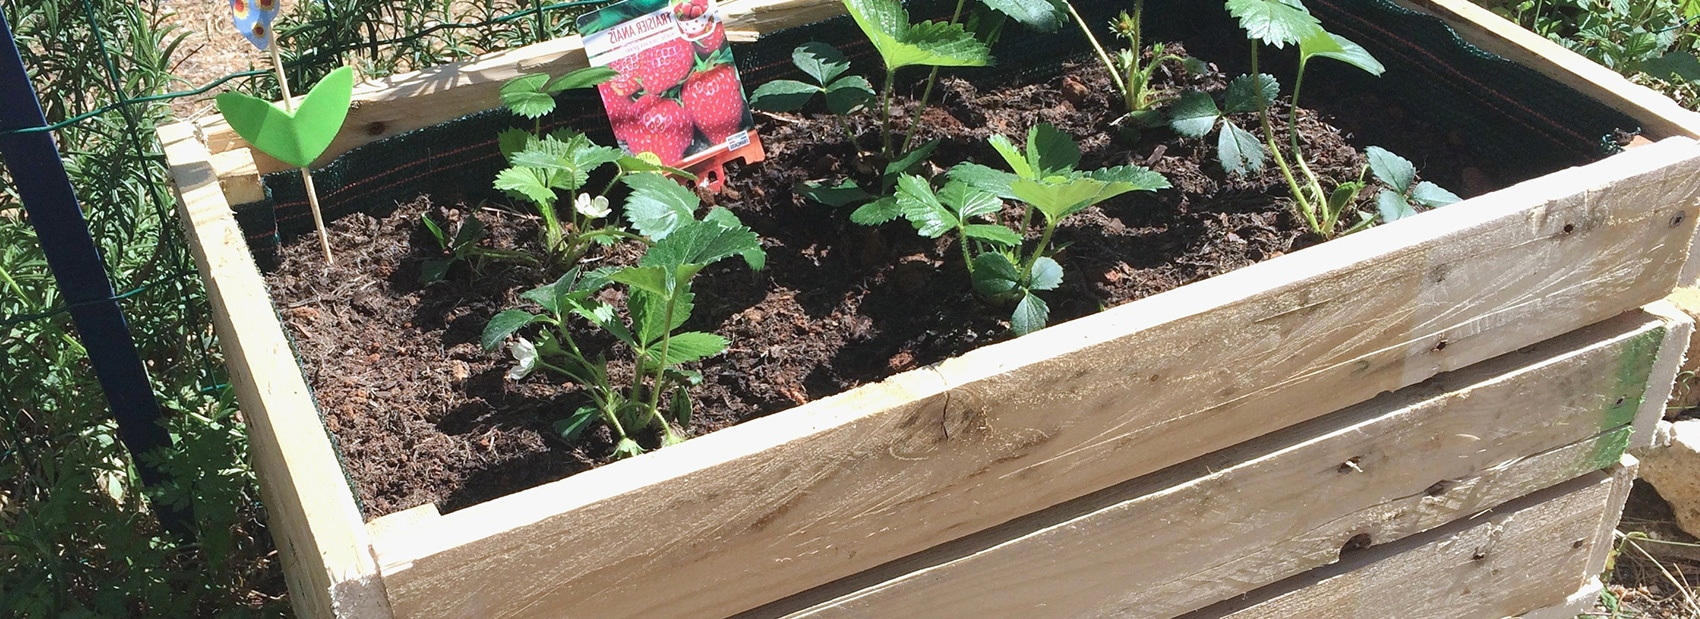 Pot Plante En Bois plantes en bacs free download read online - best free online